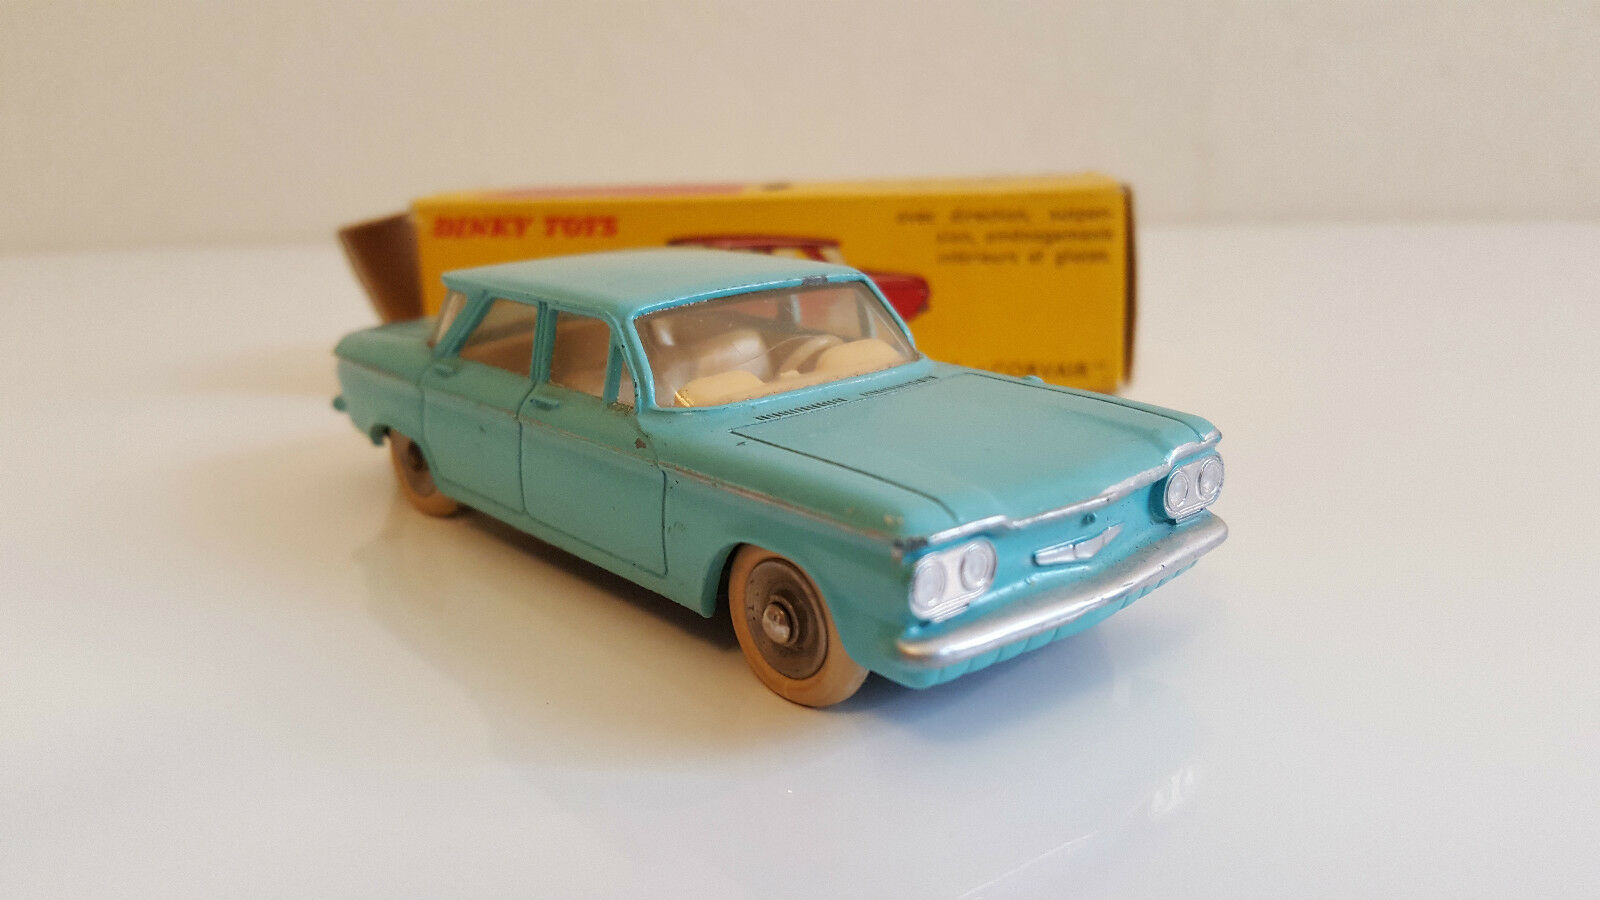 Dinky Toys - 522 - Chevrolet  Corvair en boîte d'origine  prix de gros